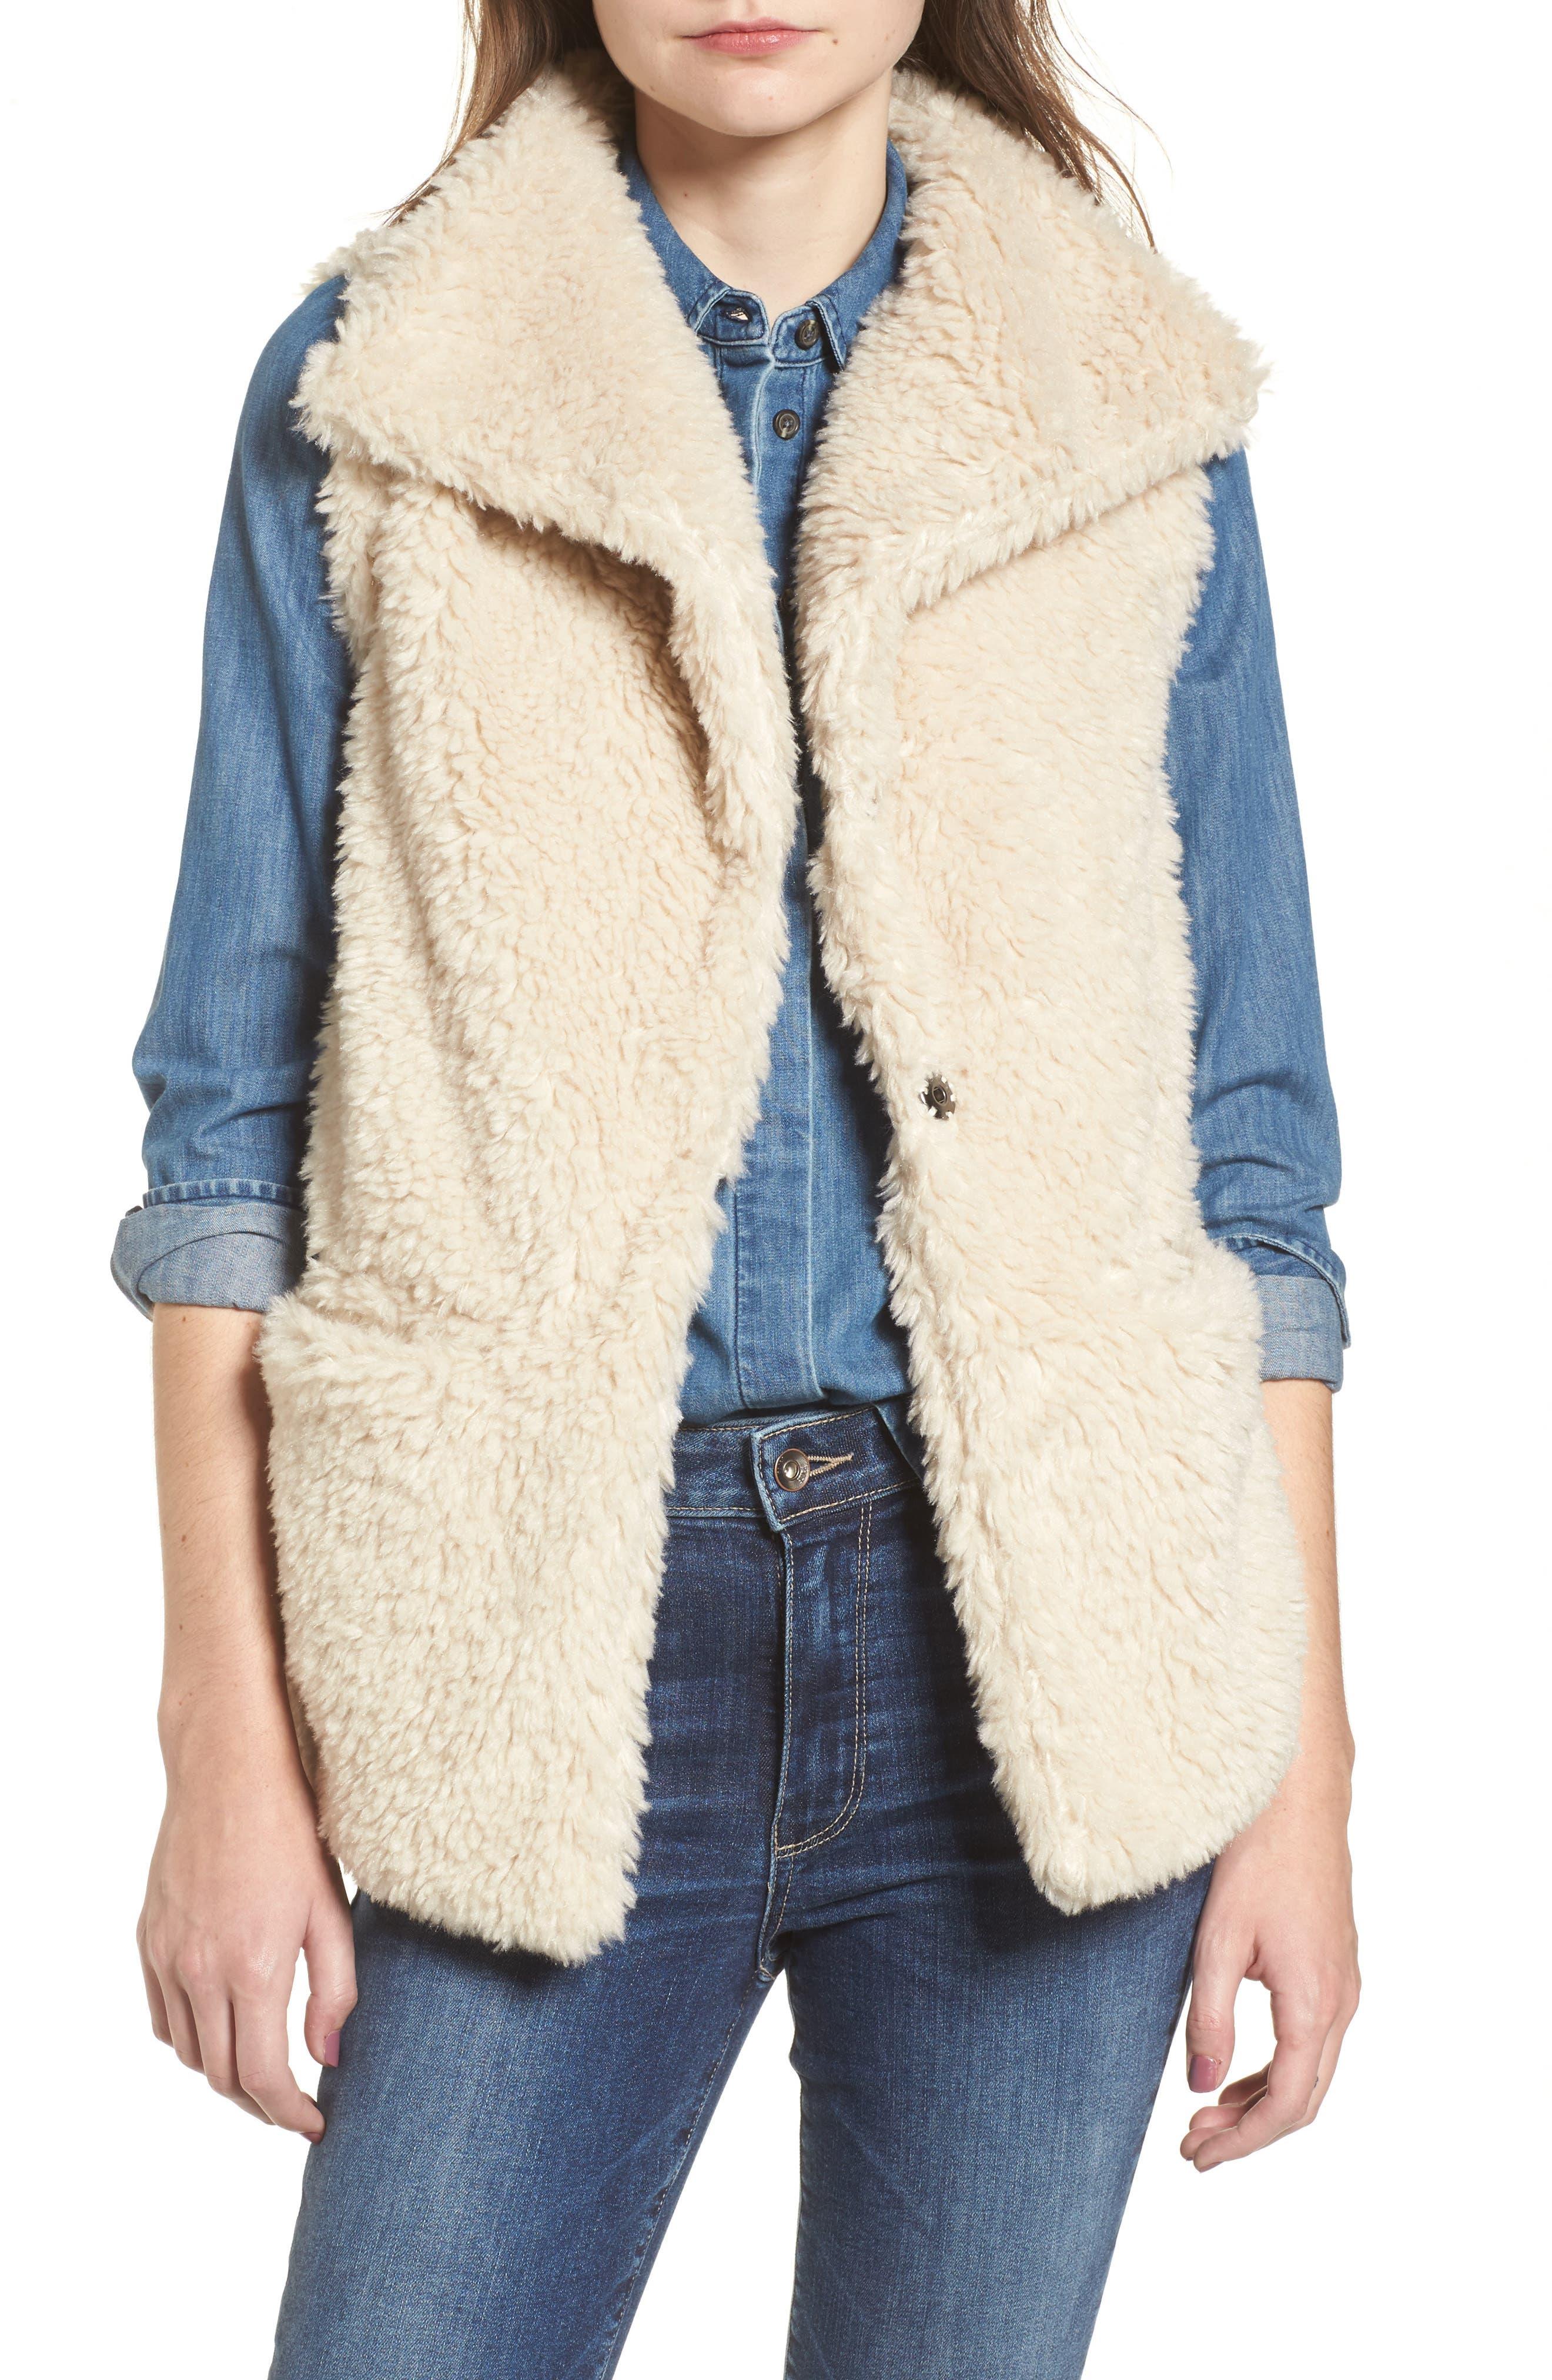 Cozy Faux Shearling Vest,                             Main thumbnail 1, color,                             Oatmeal